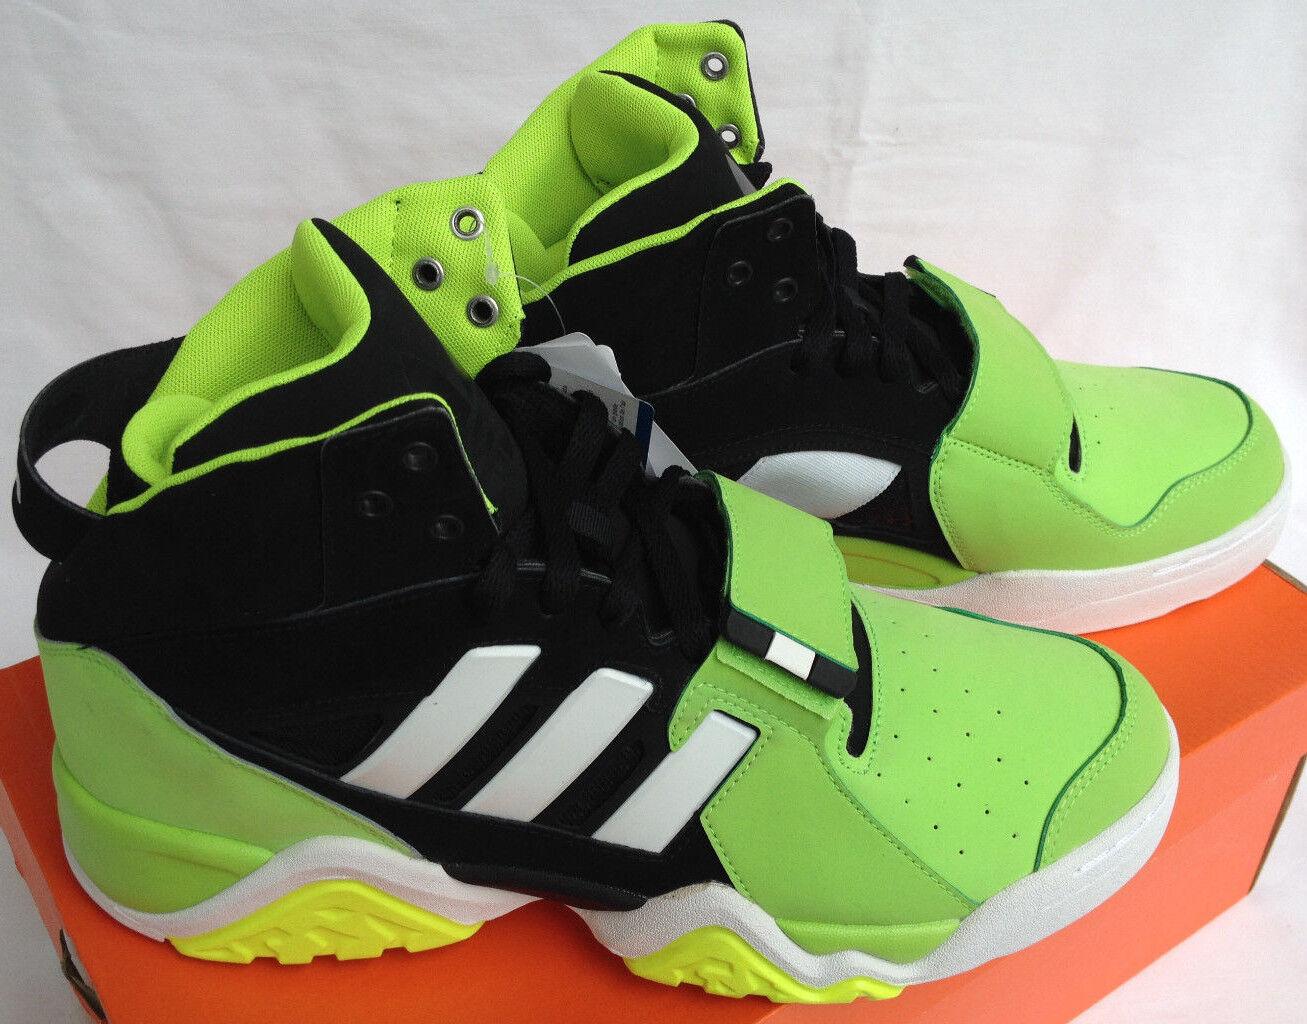 Adidas streetball 1,5 verde g99872 High Top negro verde 1,5 zapatos de baloncesto de los hombres 8 nuevos 5cc828